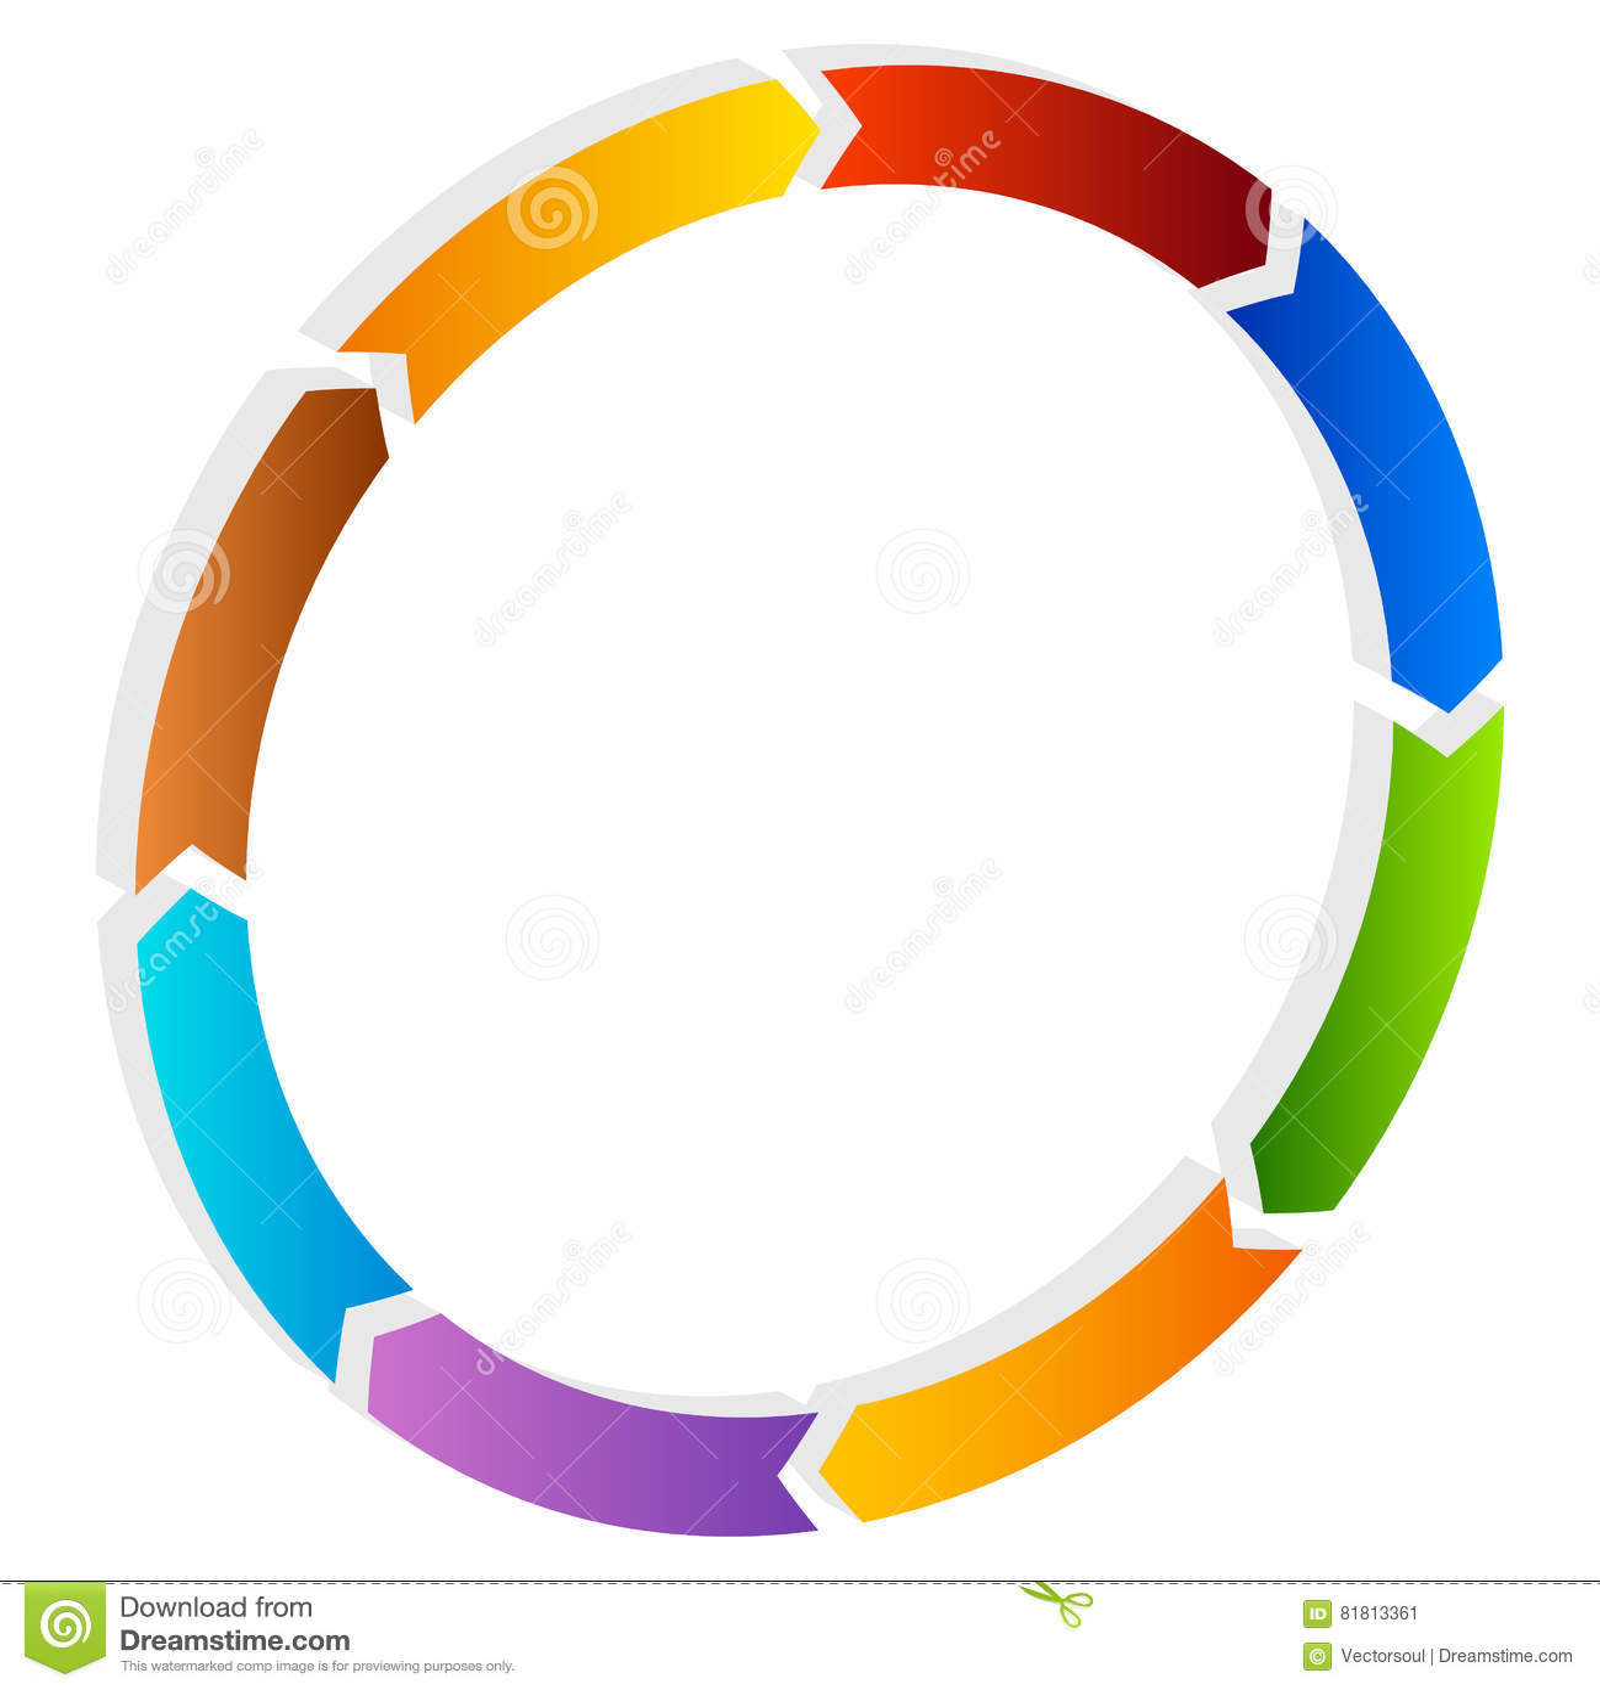 arrow circular process diagram toyota mr2 alternator wiring segmented circle icon